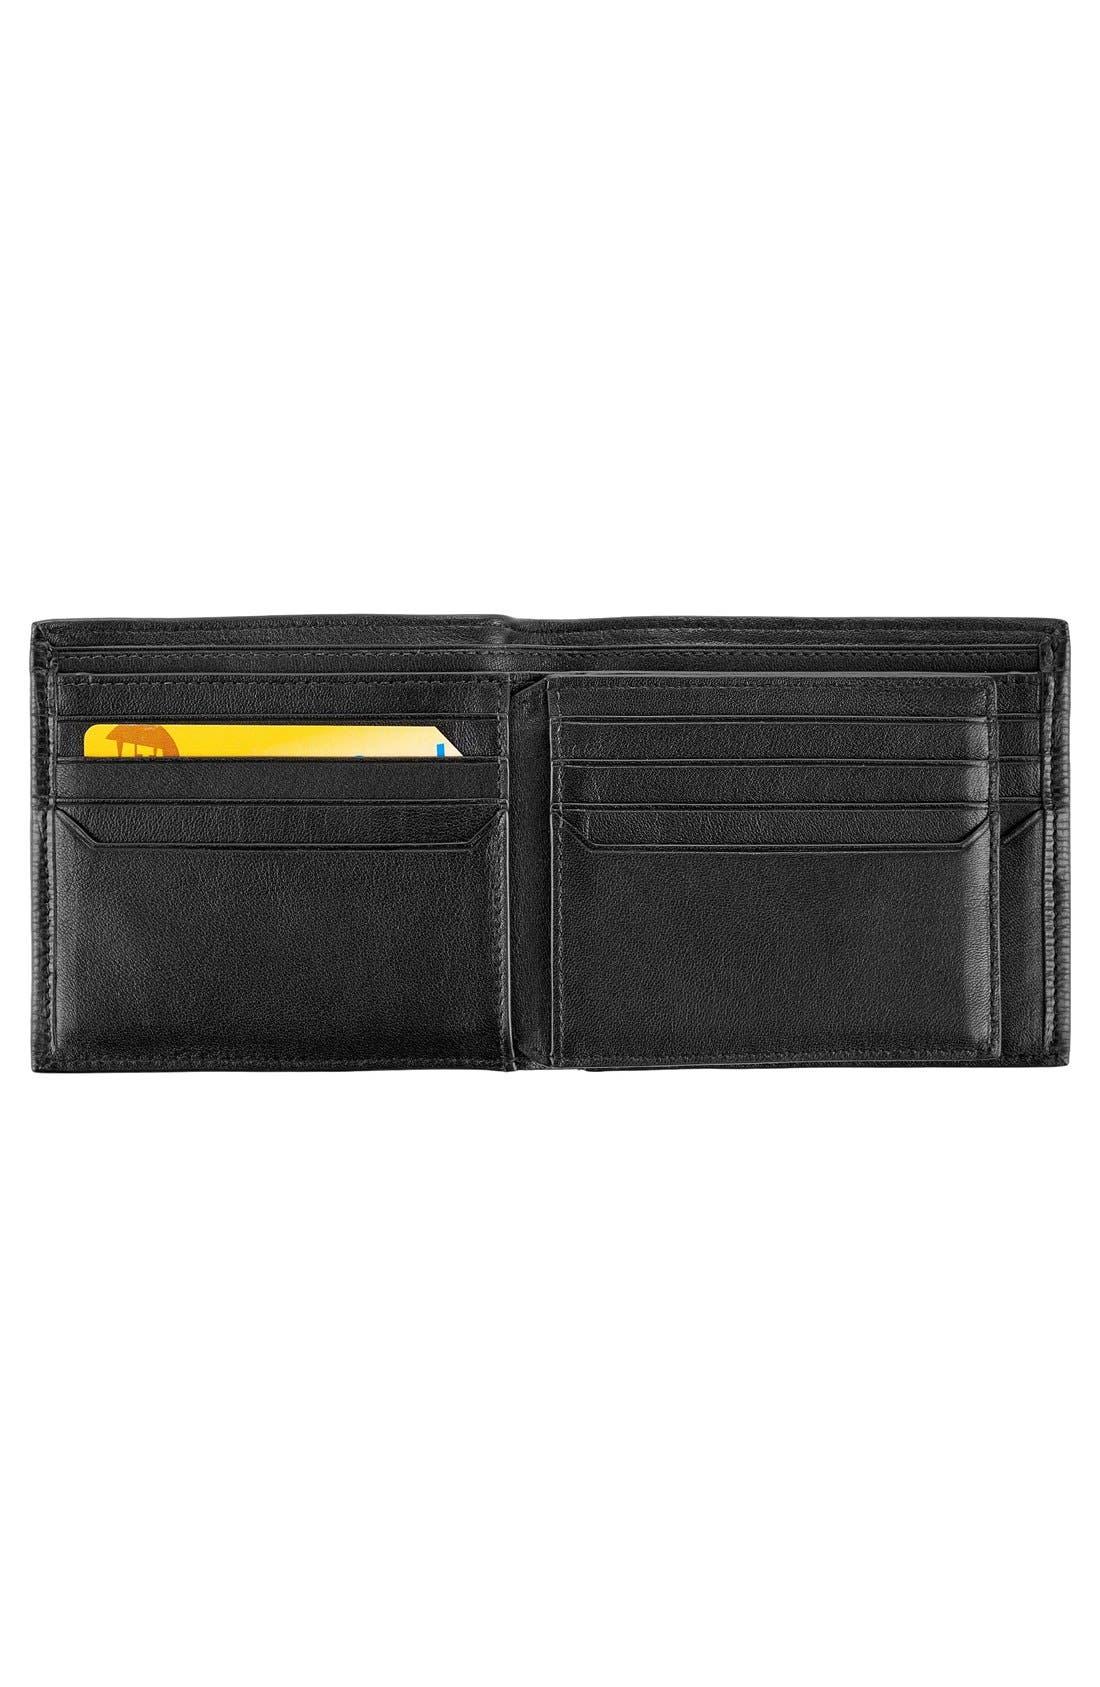 Monaco Global Billfold Wallet,                             Alternate thumbnail 3, color,                             Black